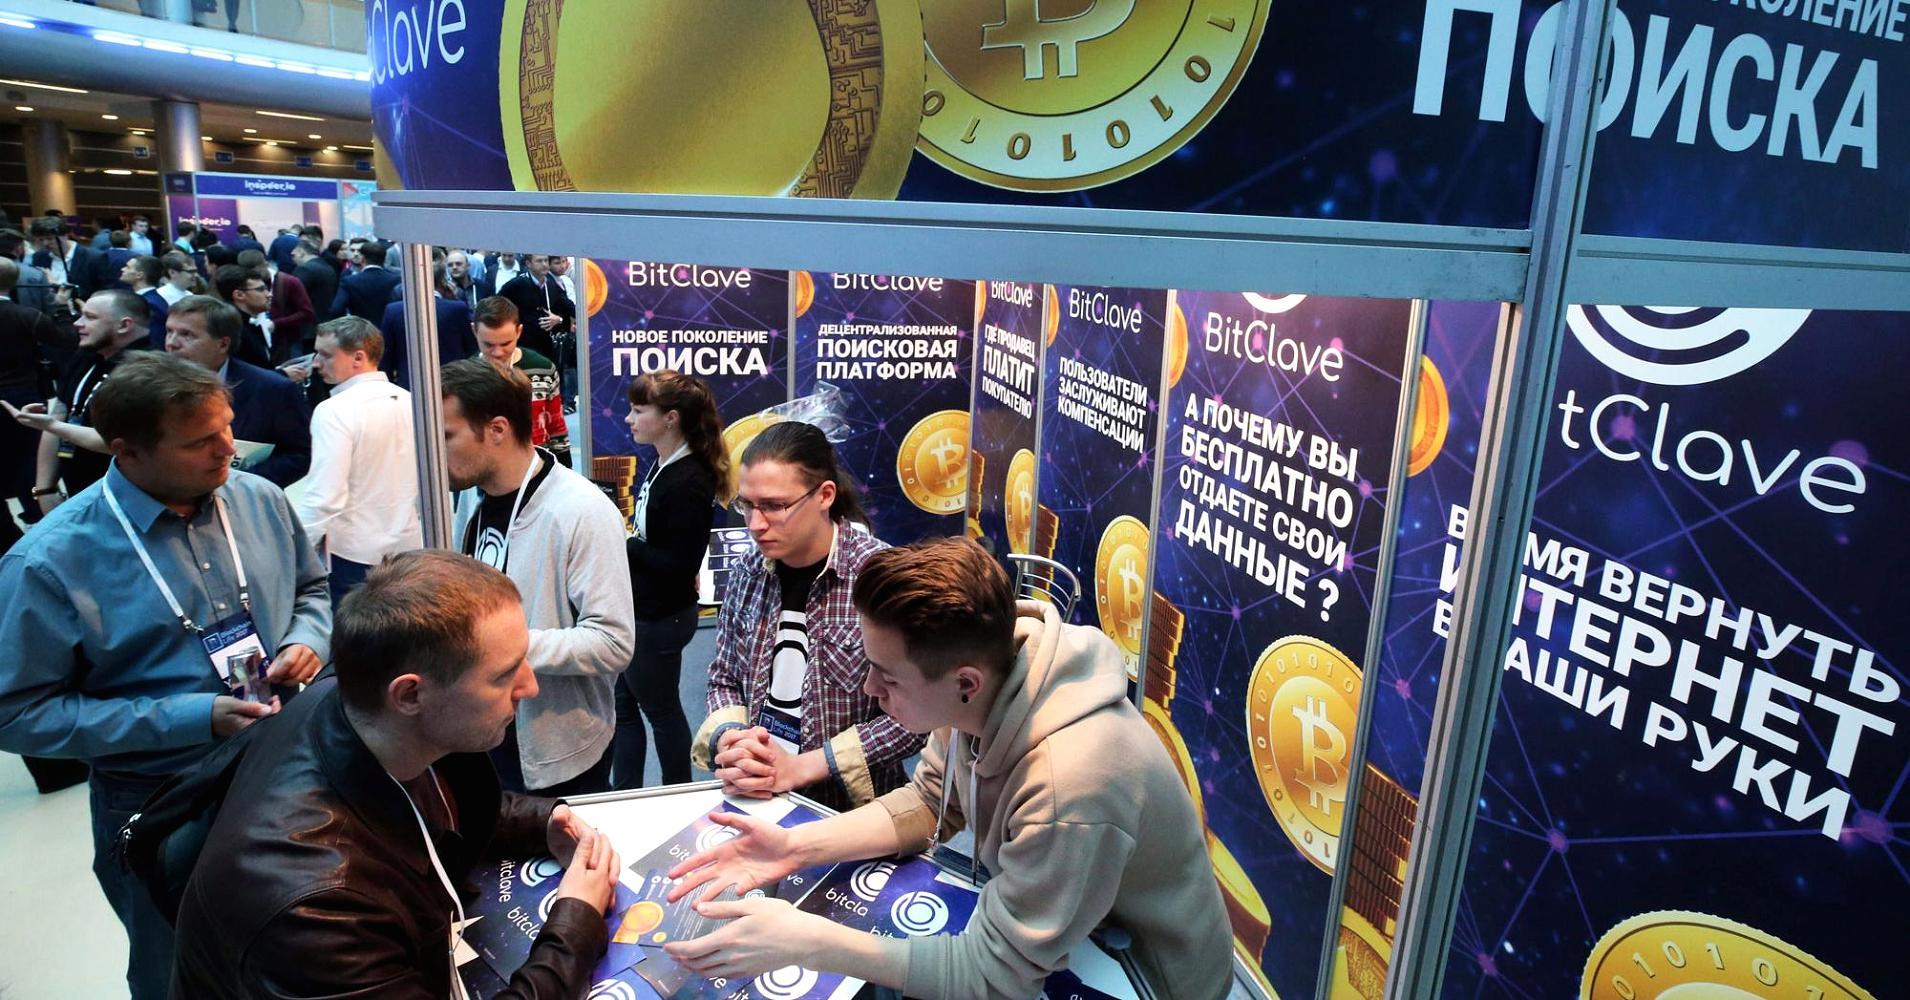 Cryptocurrency nodoklis 2019